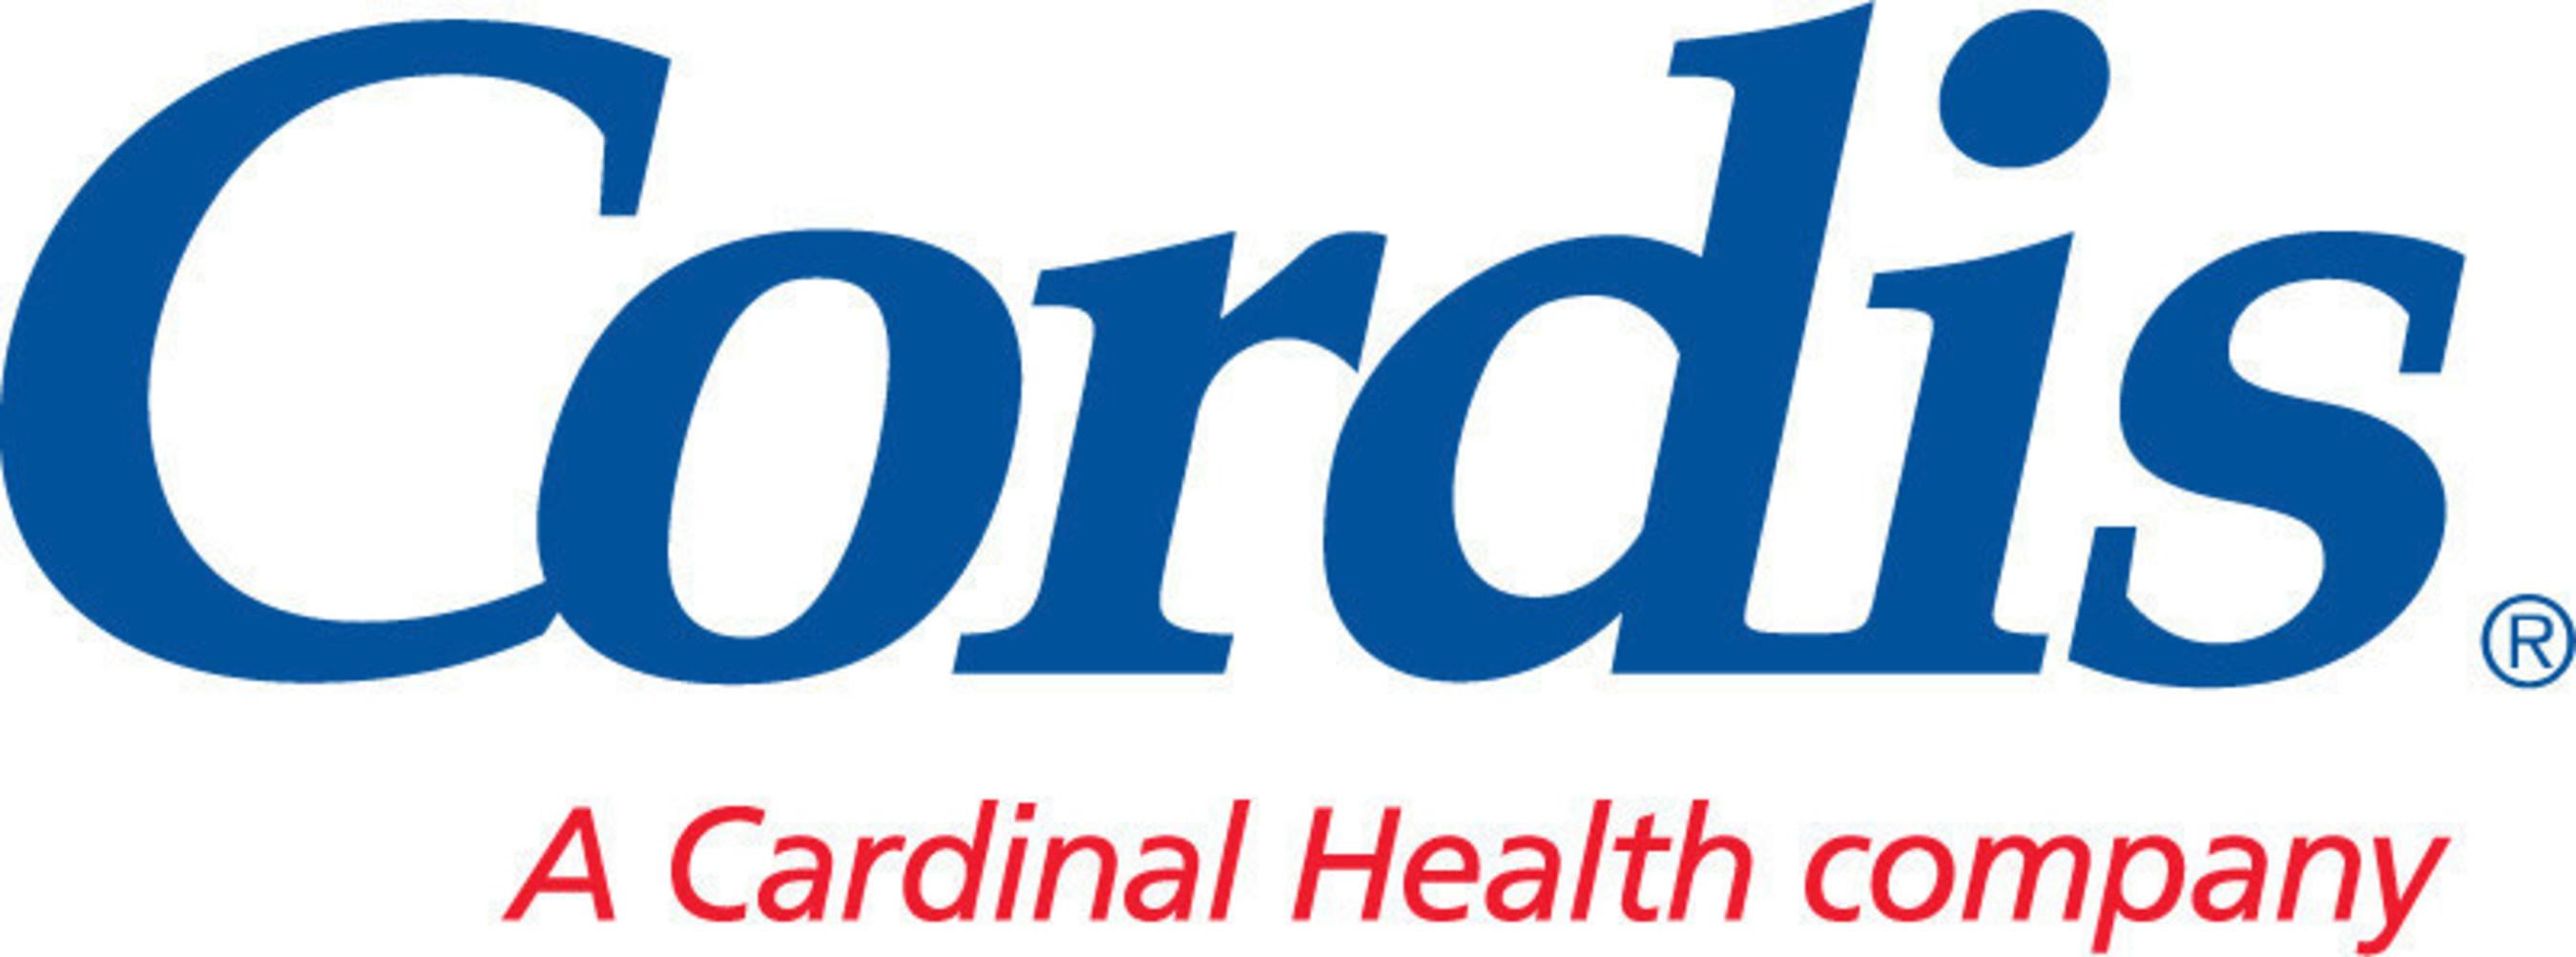 Cordis, a Cardinal Health company